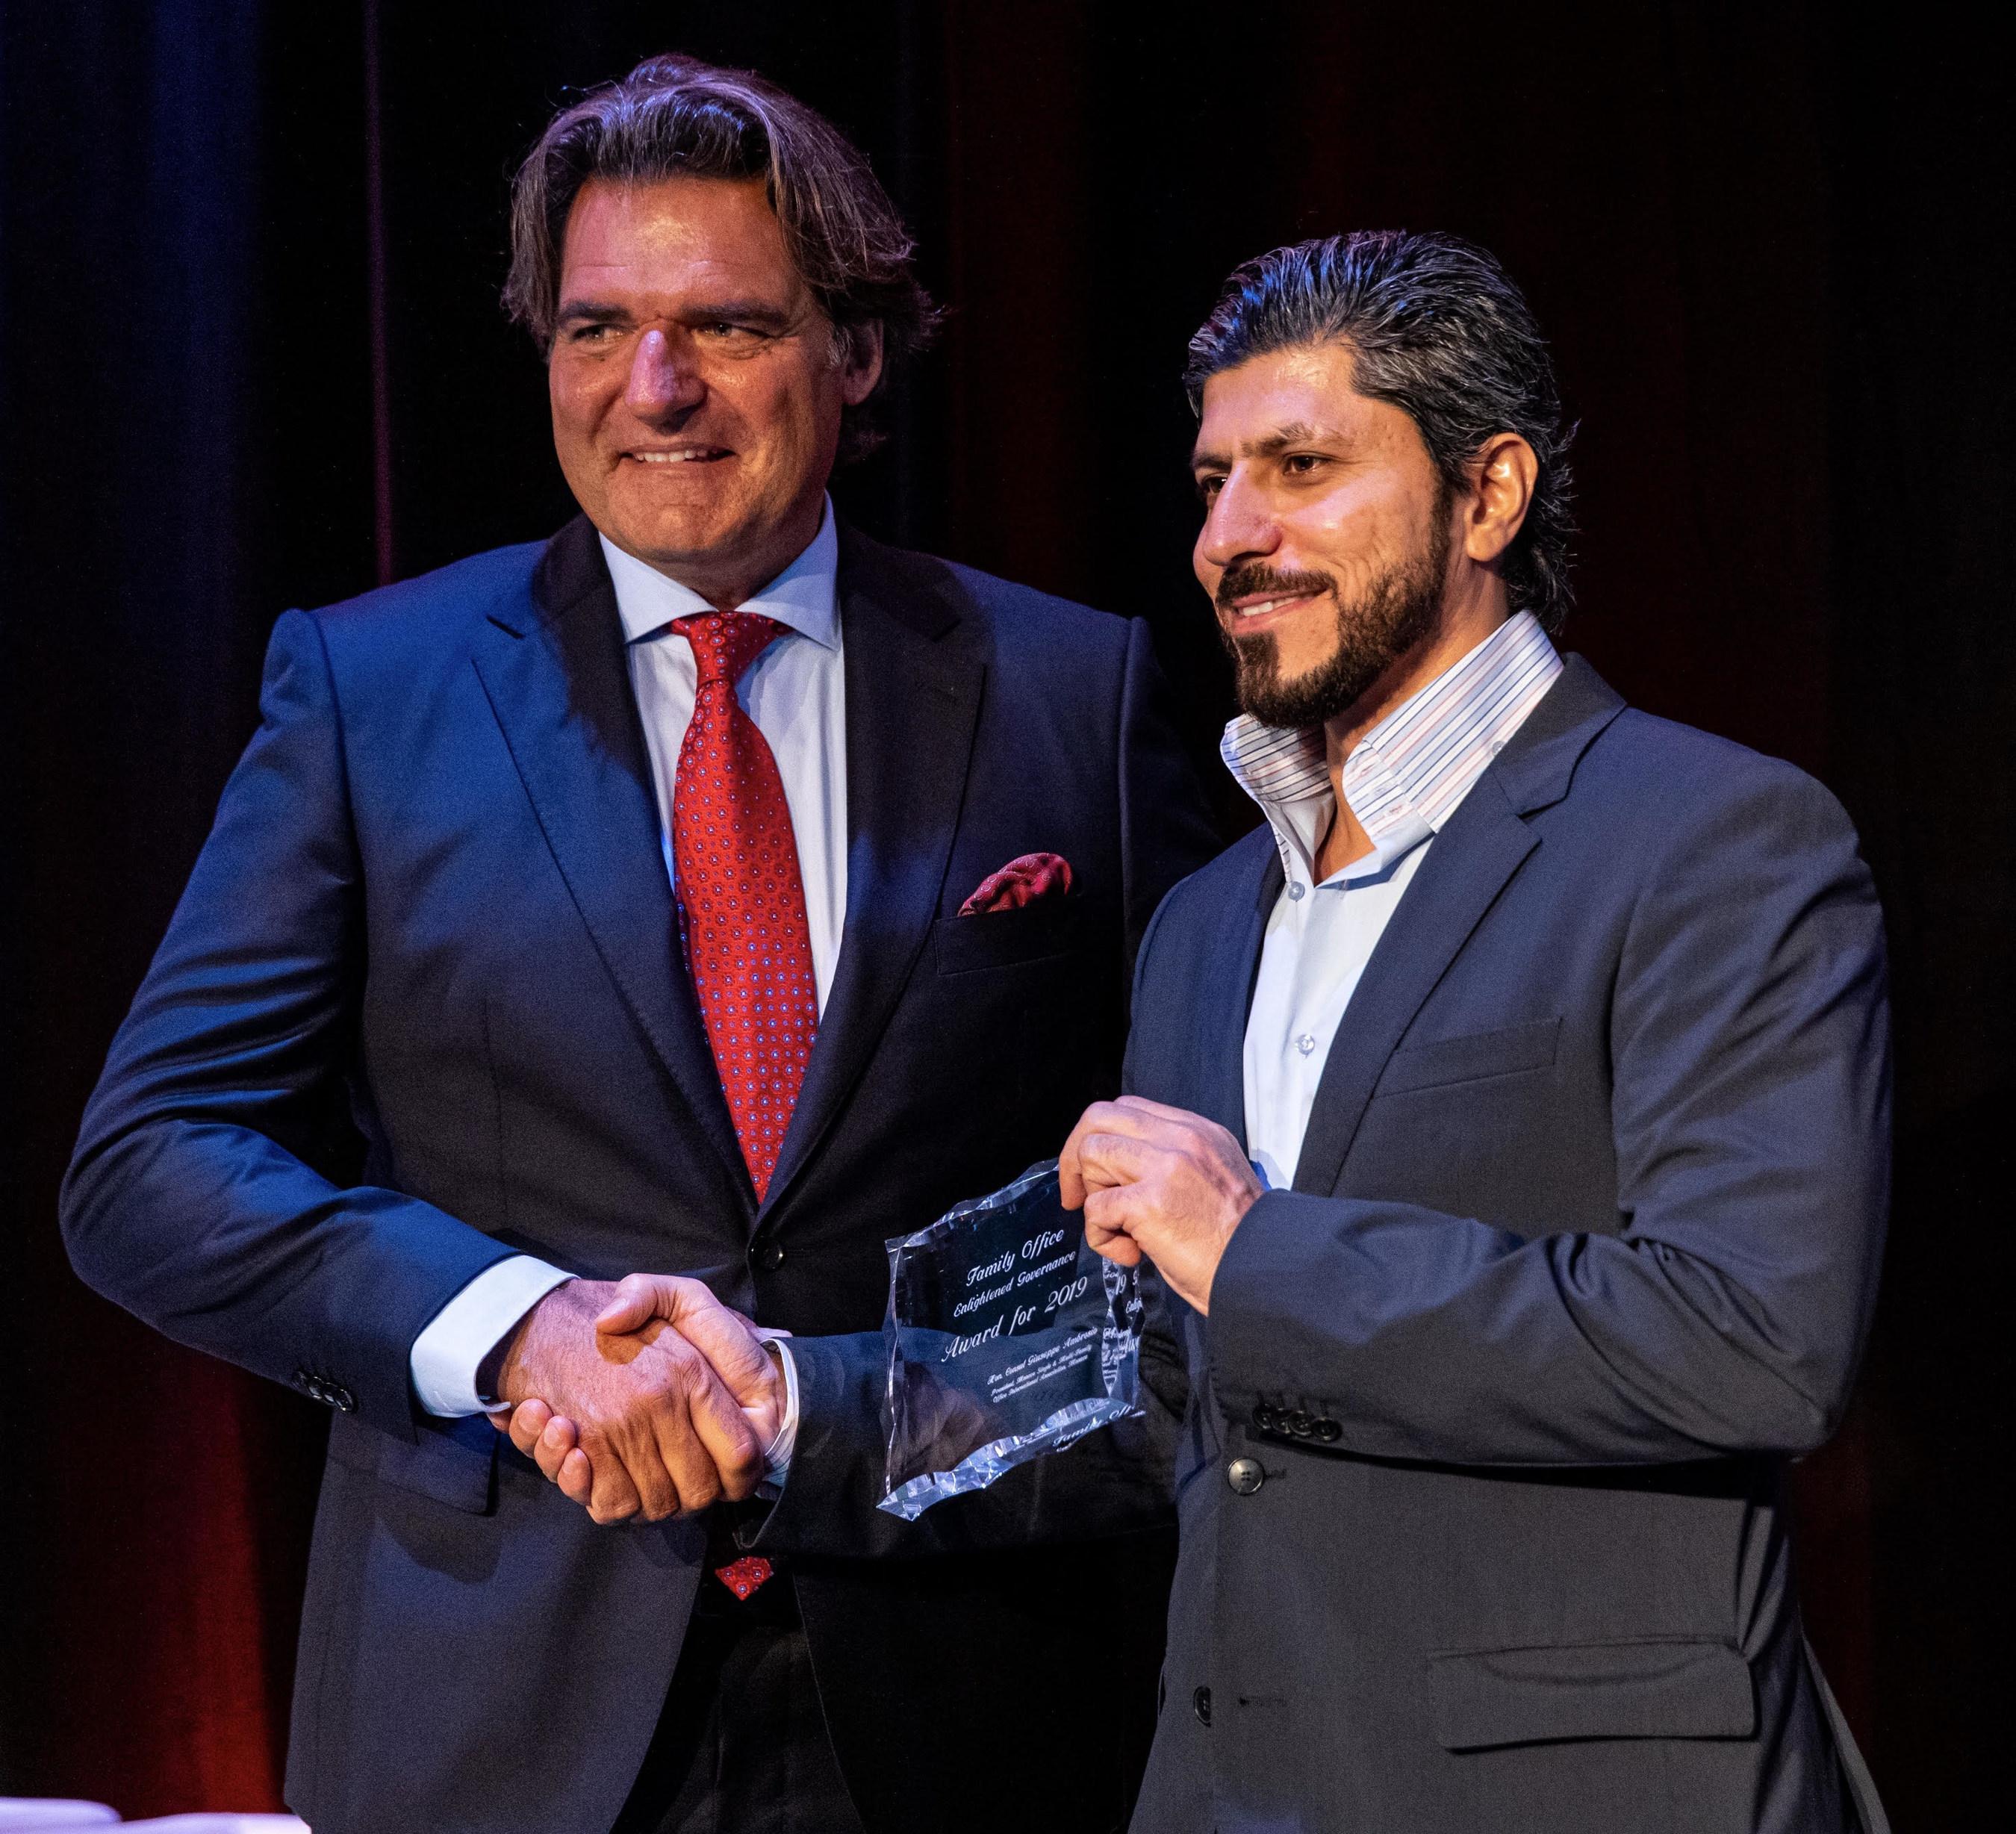 Mohamed Al Ali Presented With Family Office Enlightened